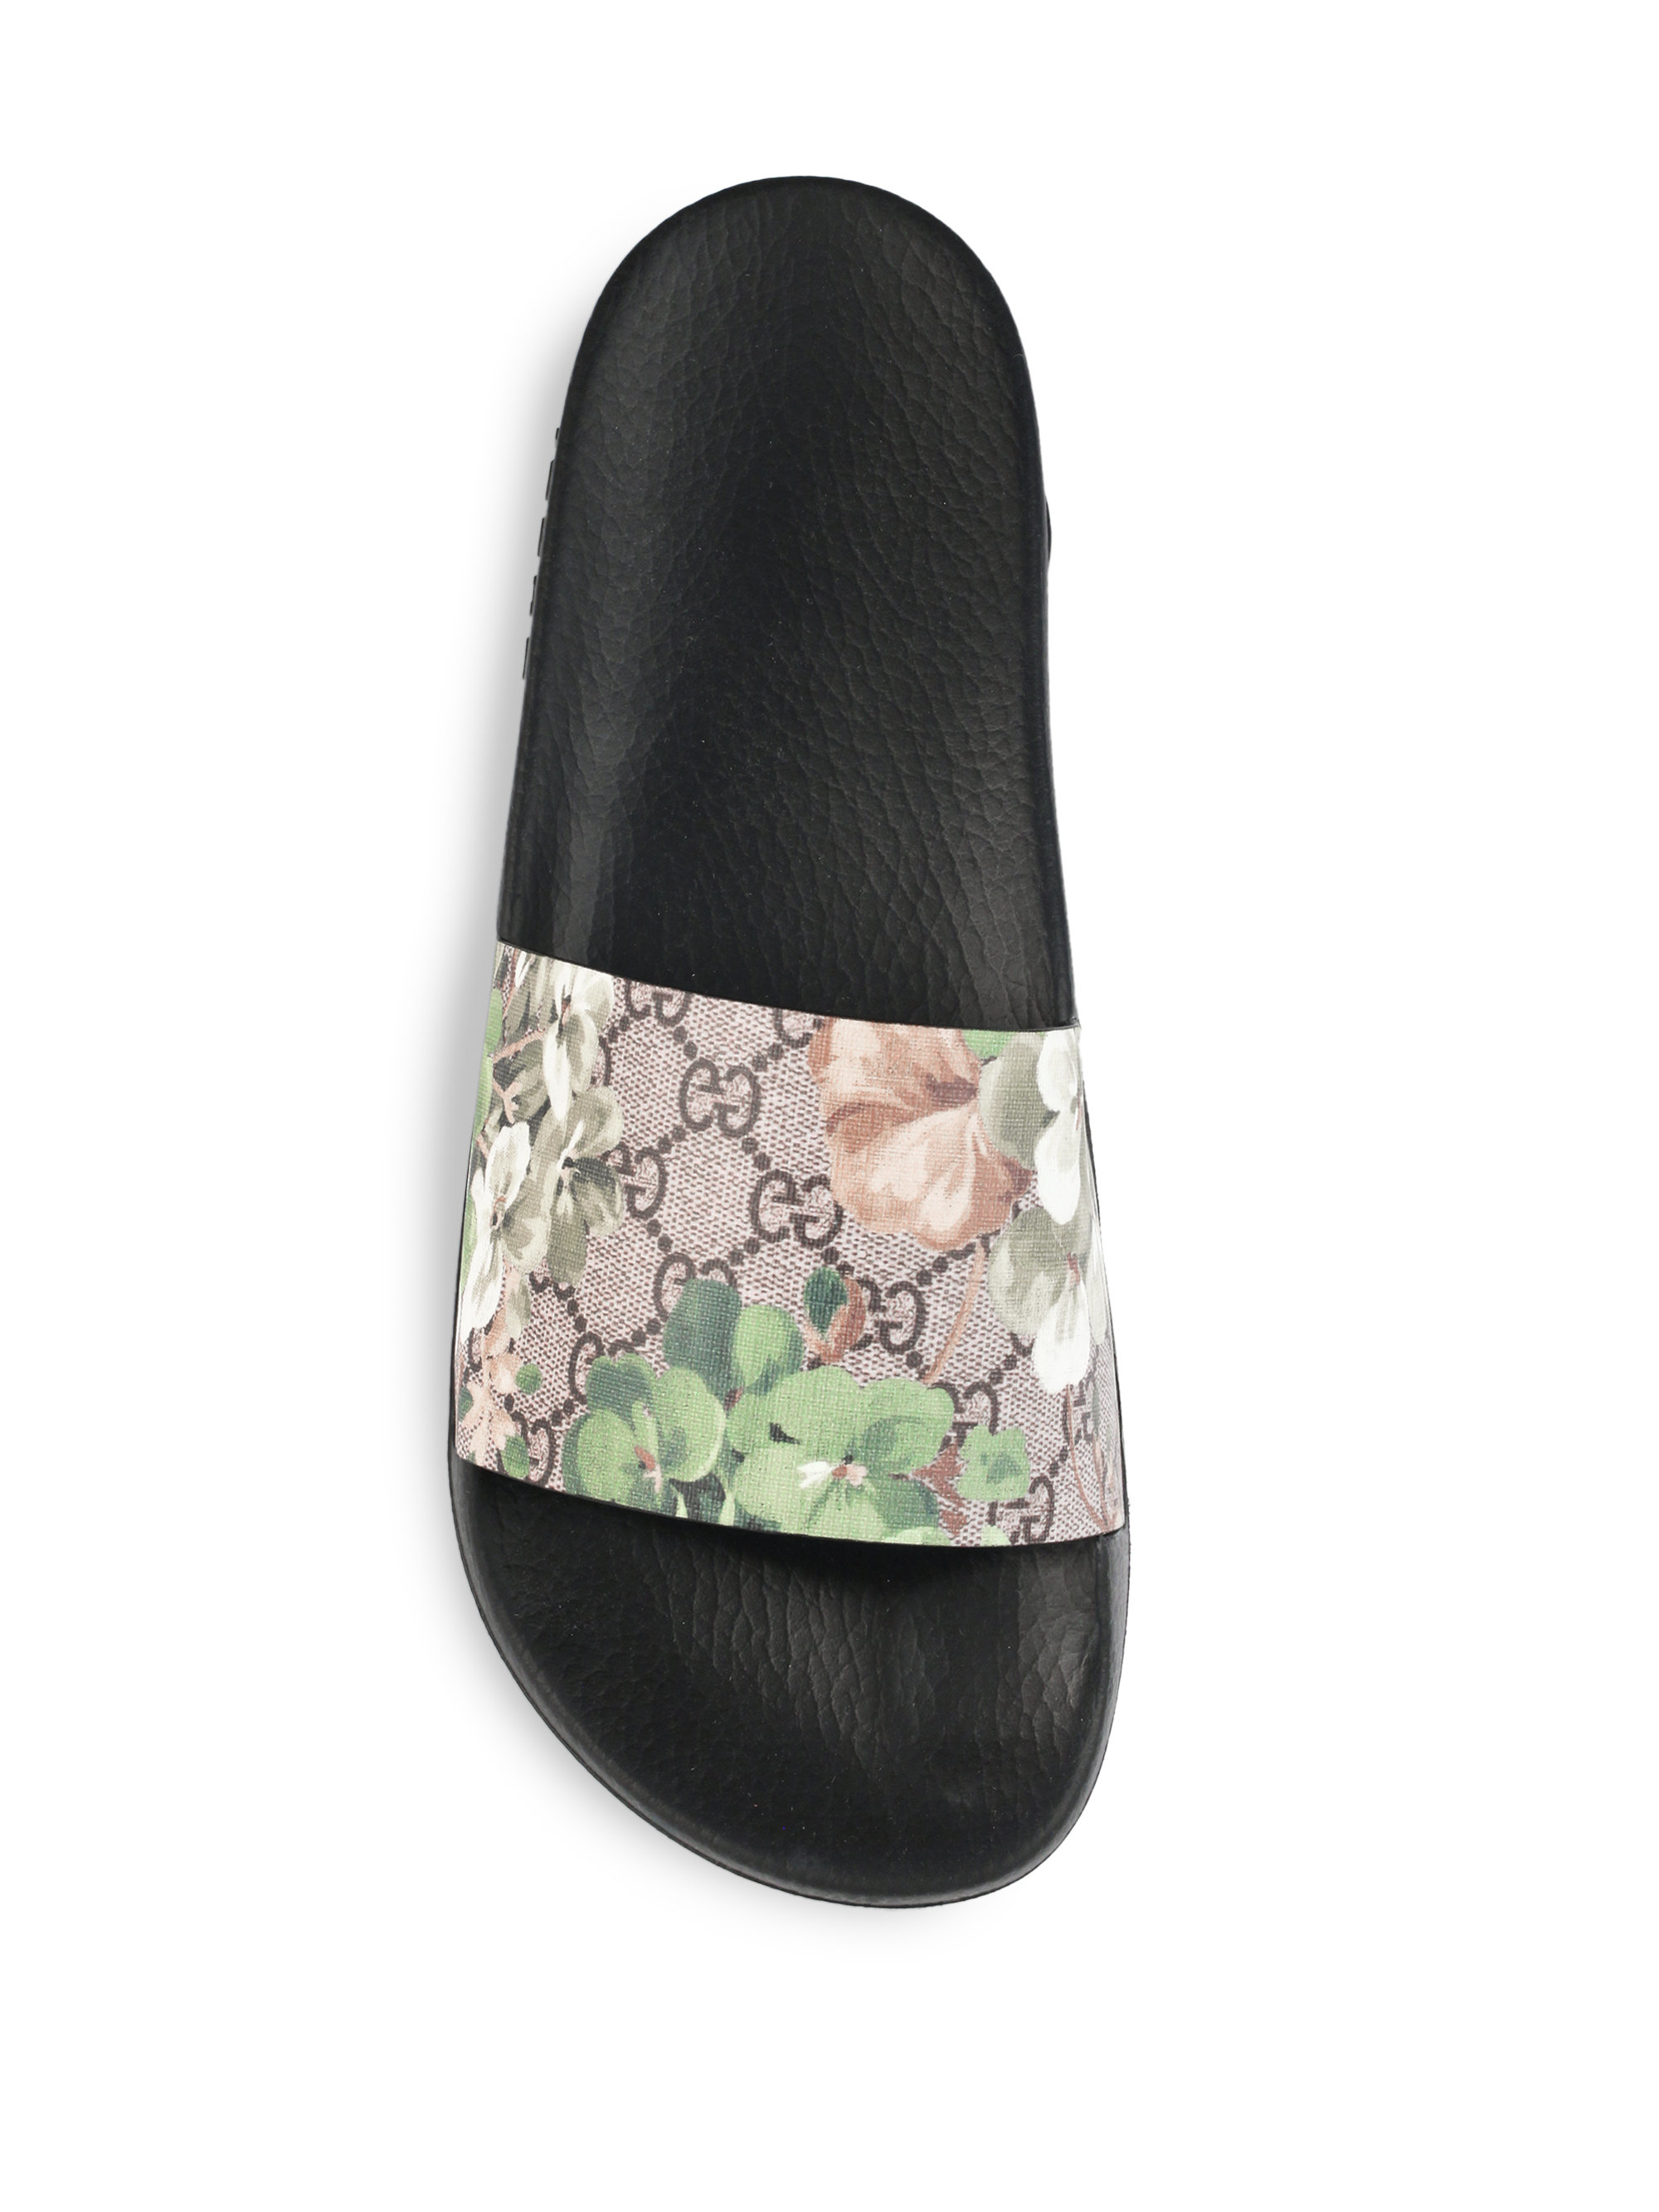 Gucci Pursuit Blooms Print Sandals In Multicolor Lyst